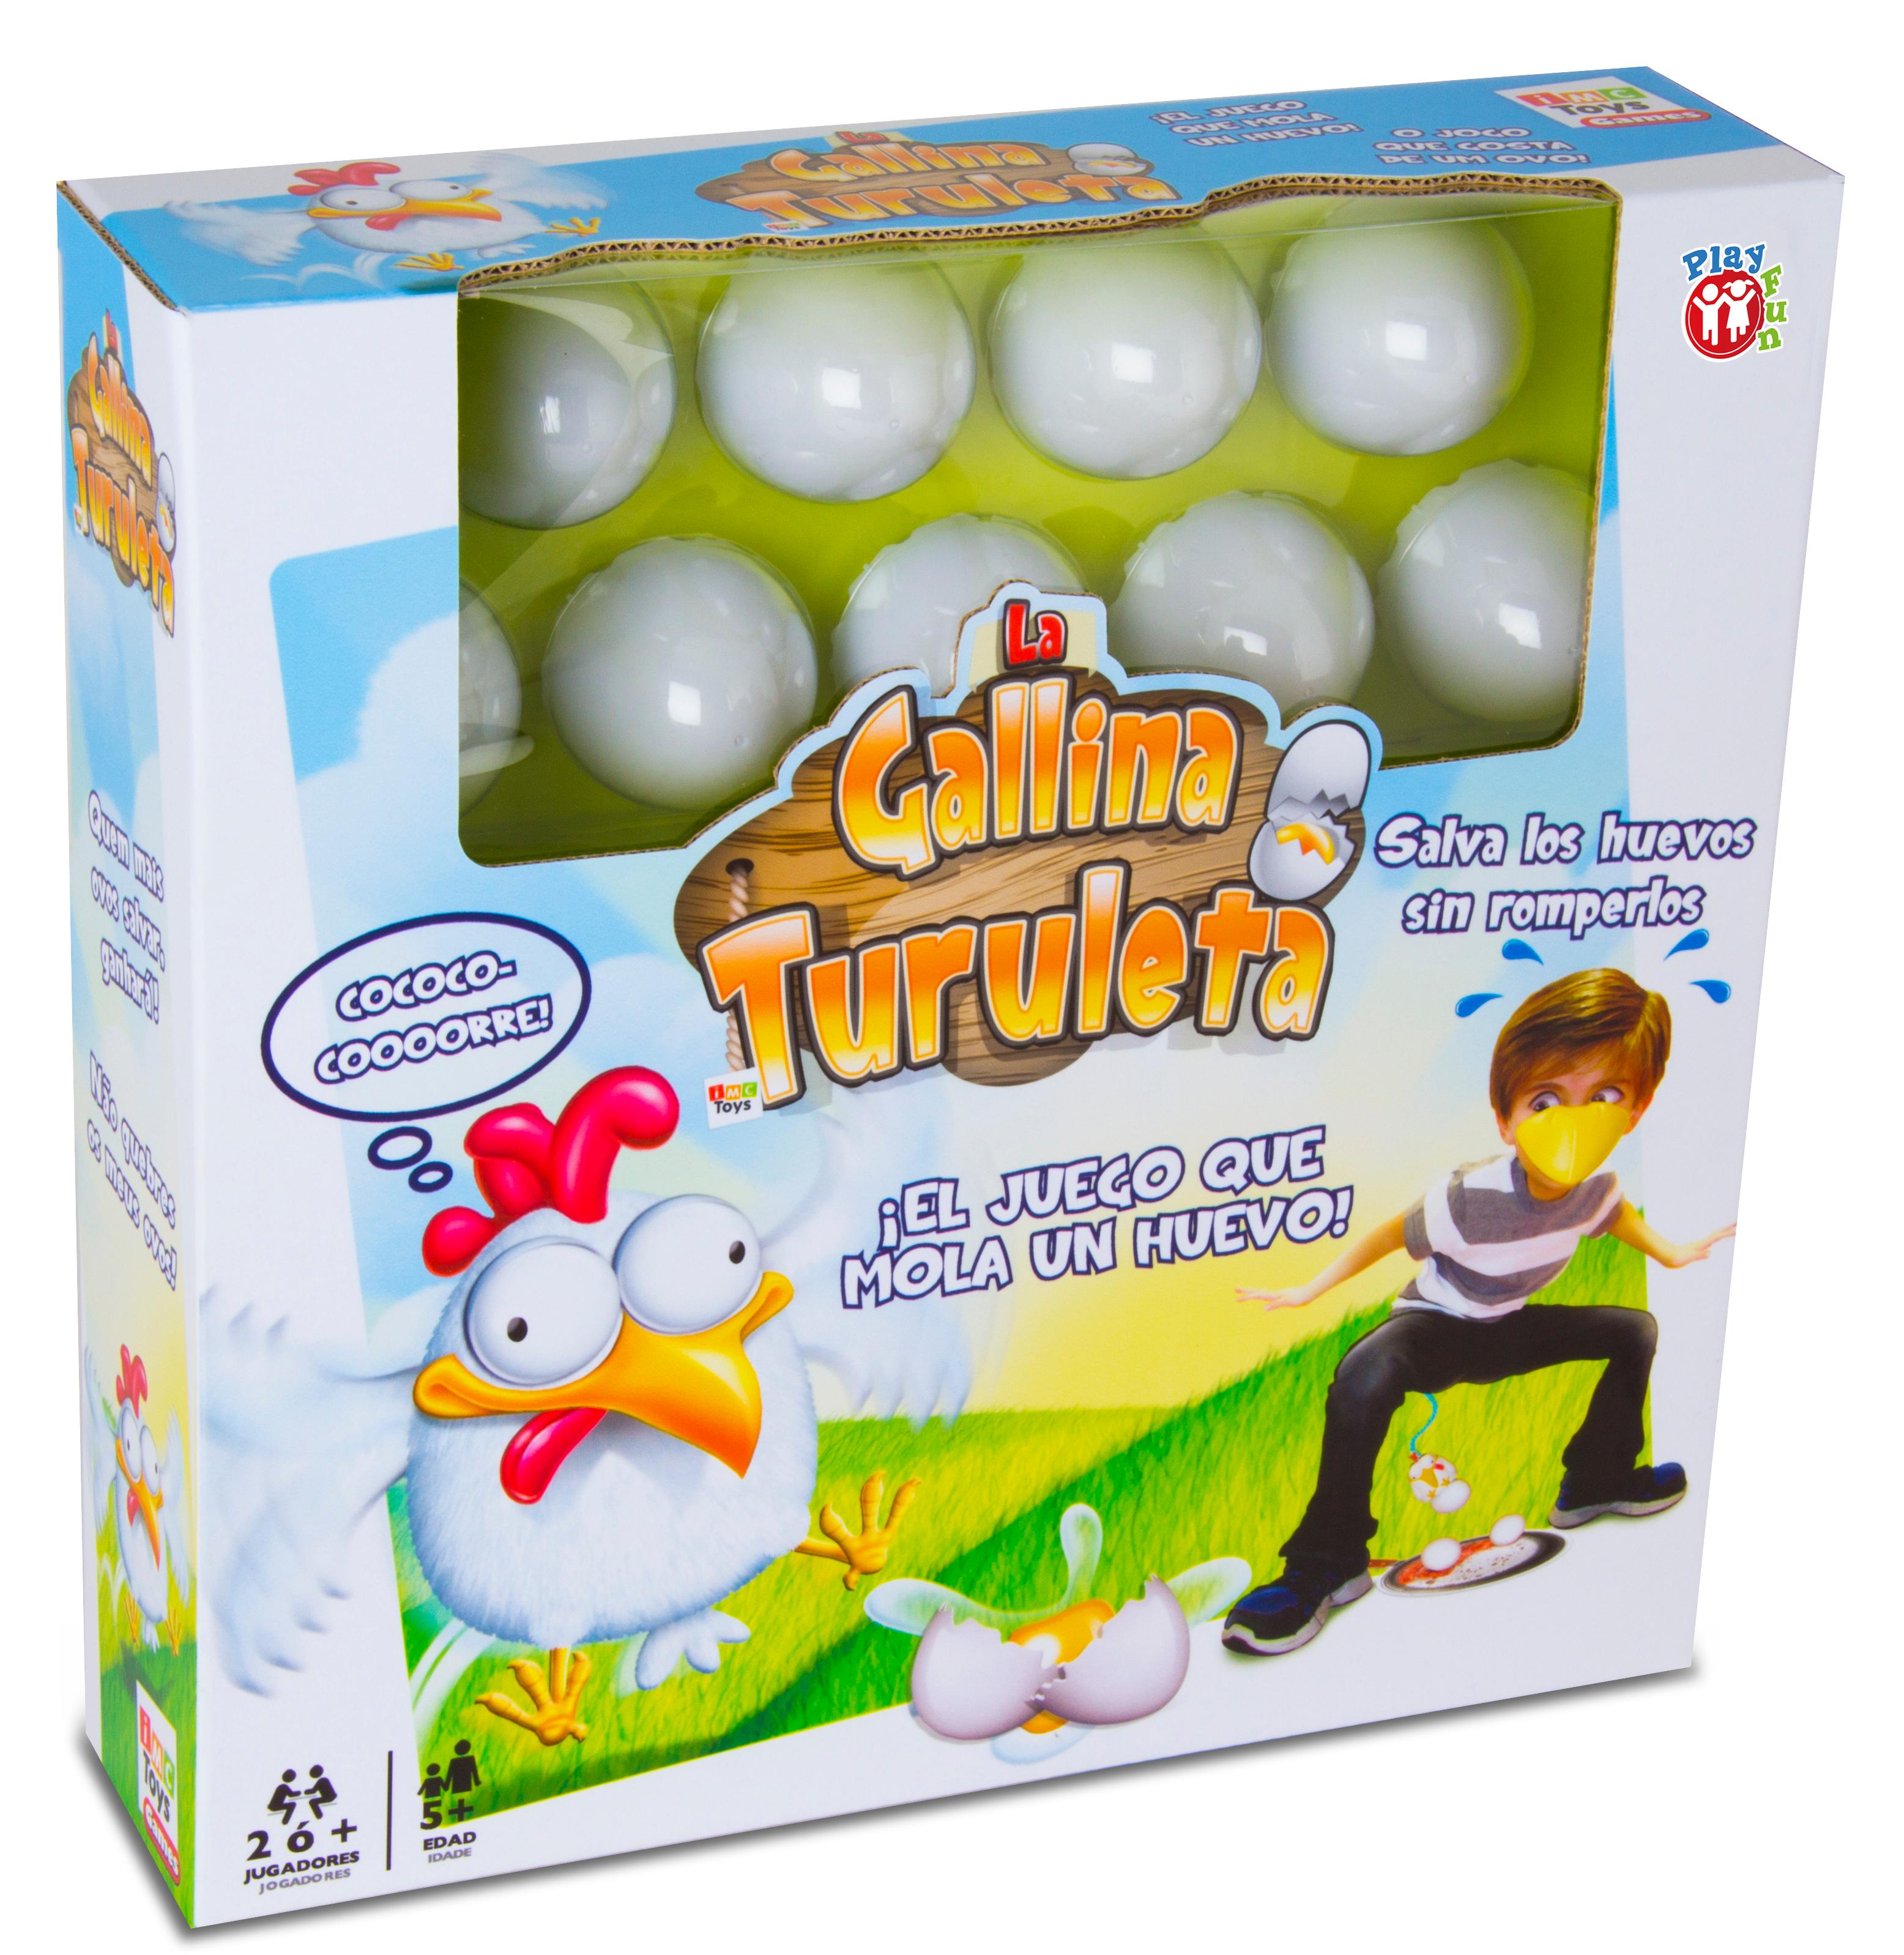 IMC Toys-La Gallina Turuleta, Miscelanea (94864): Amazon.es ...